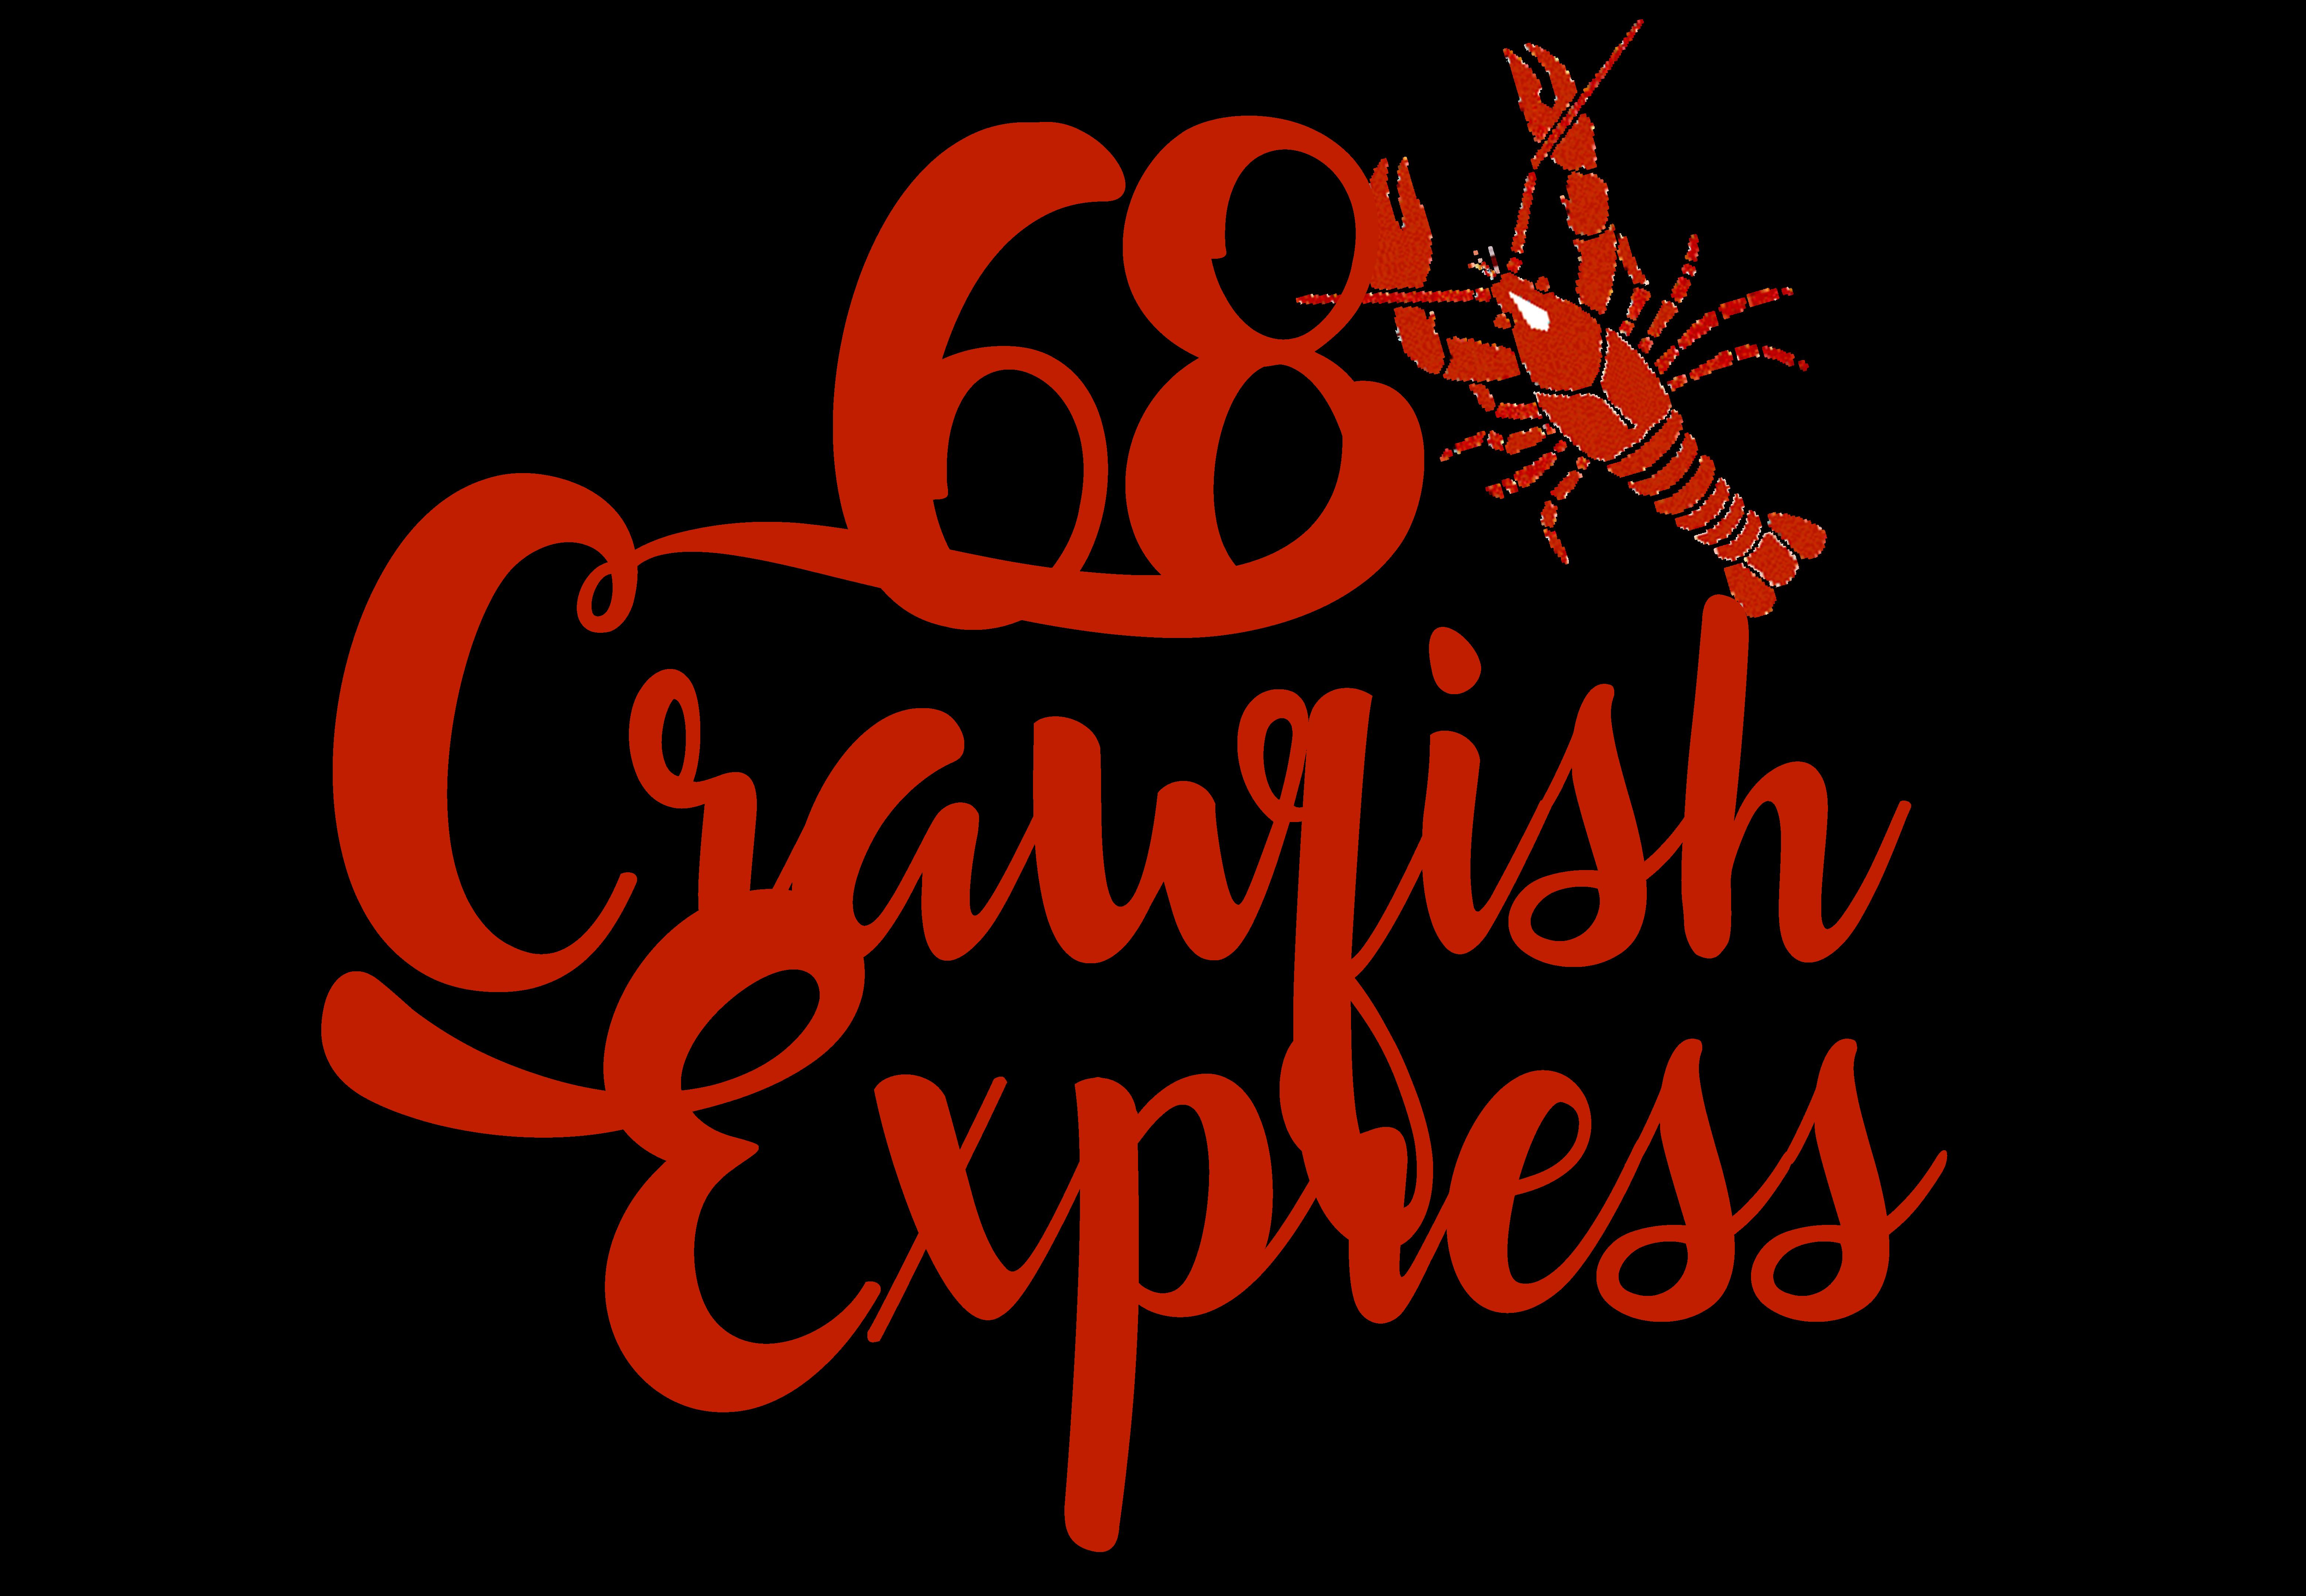 Crawfish clipart yabbie.  express